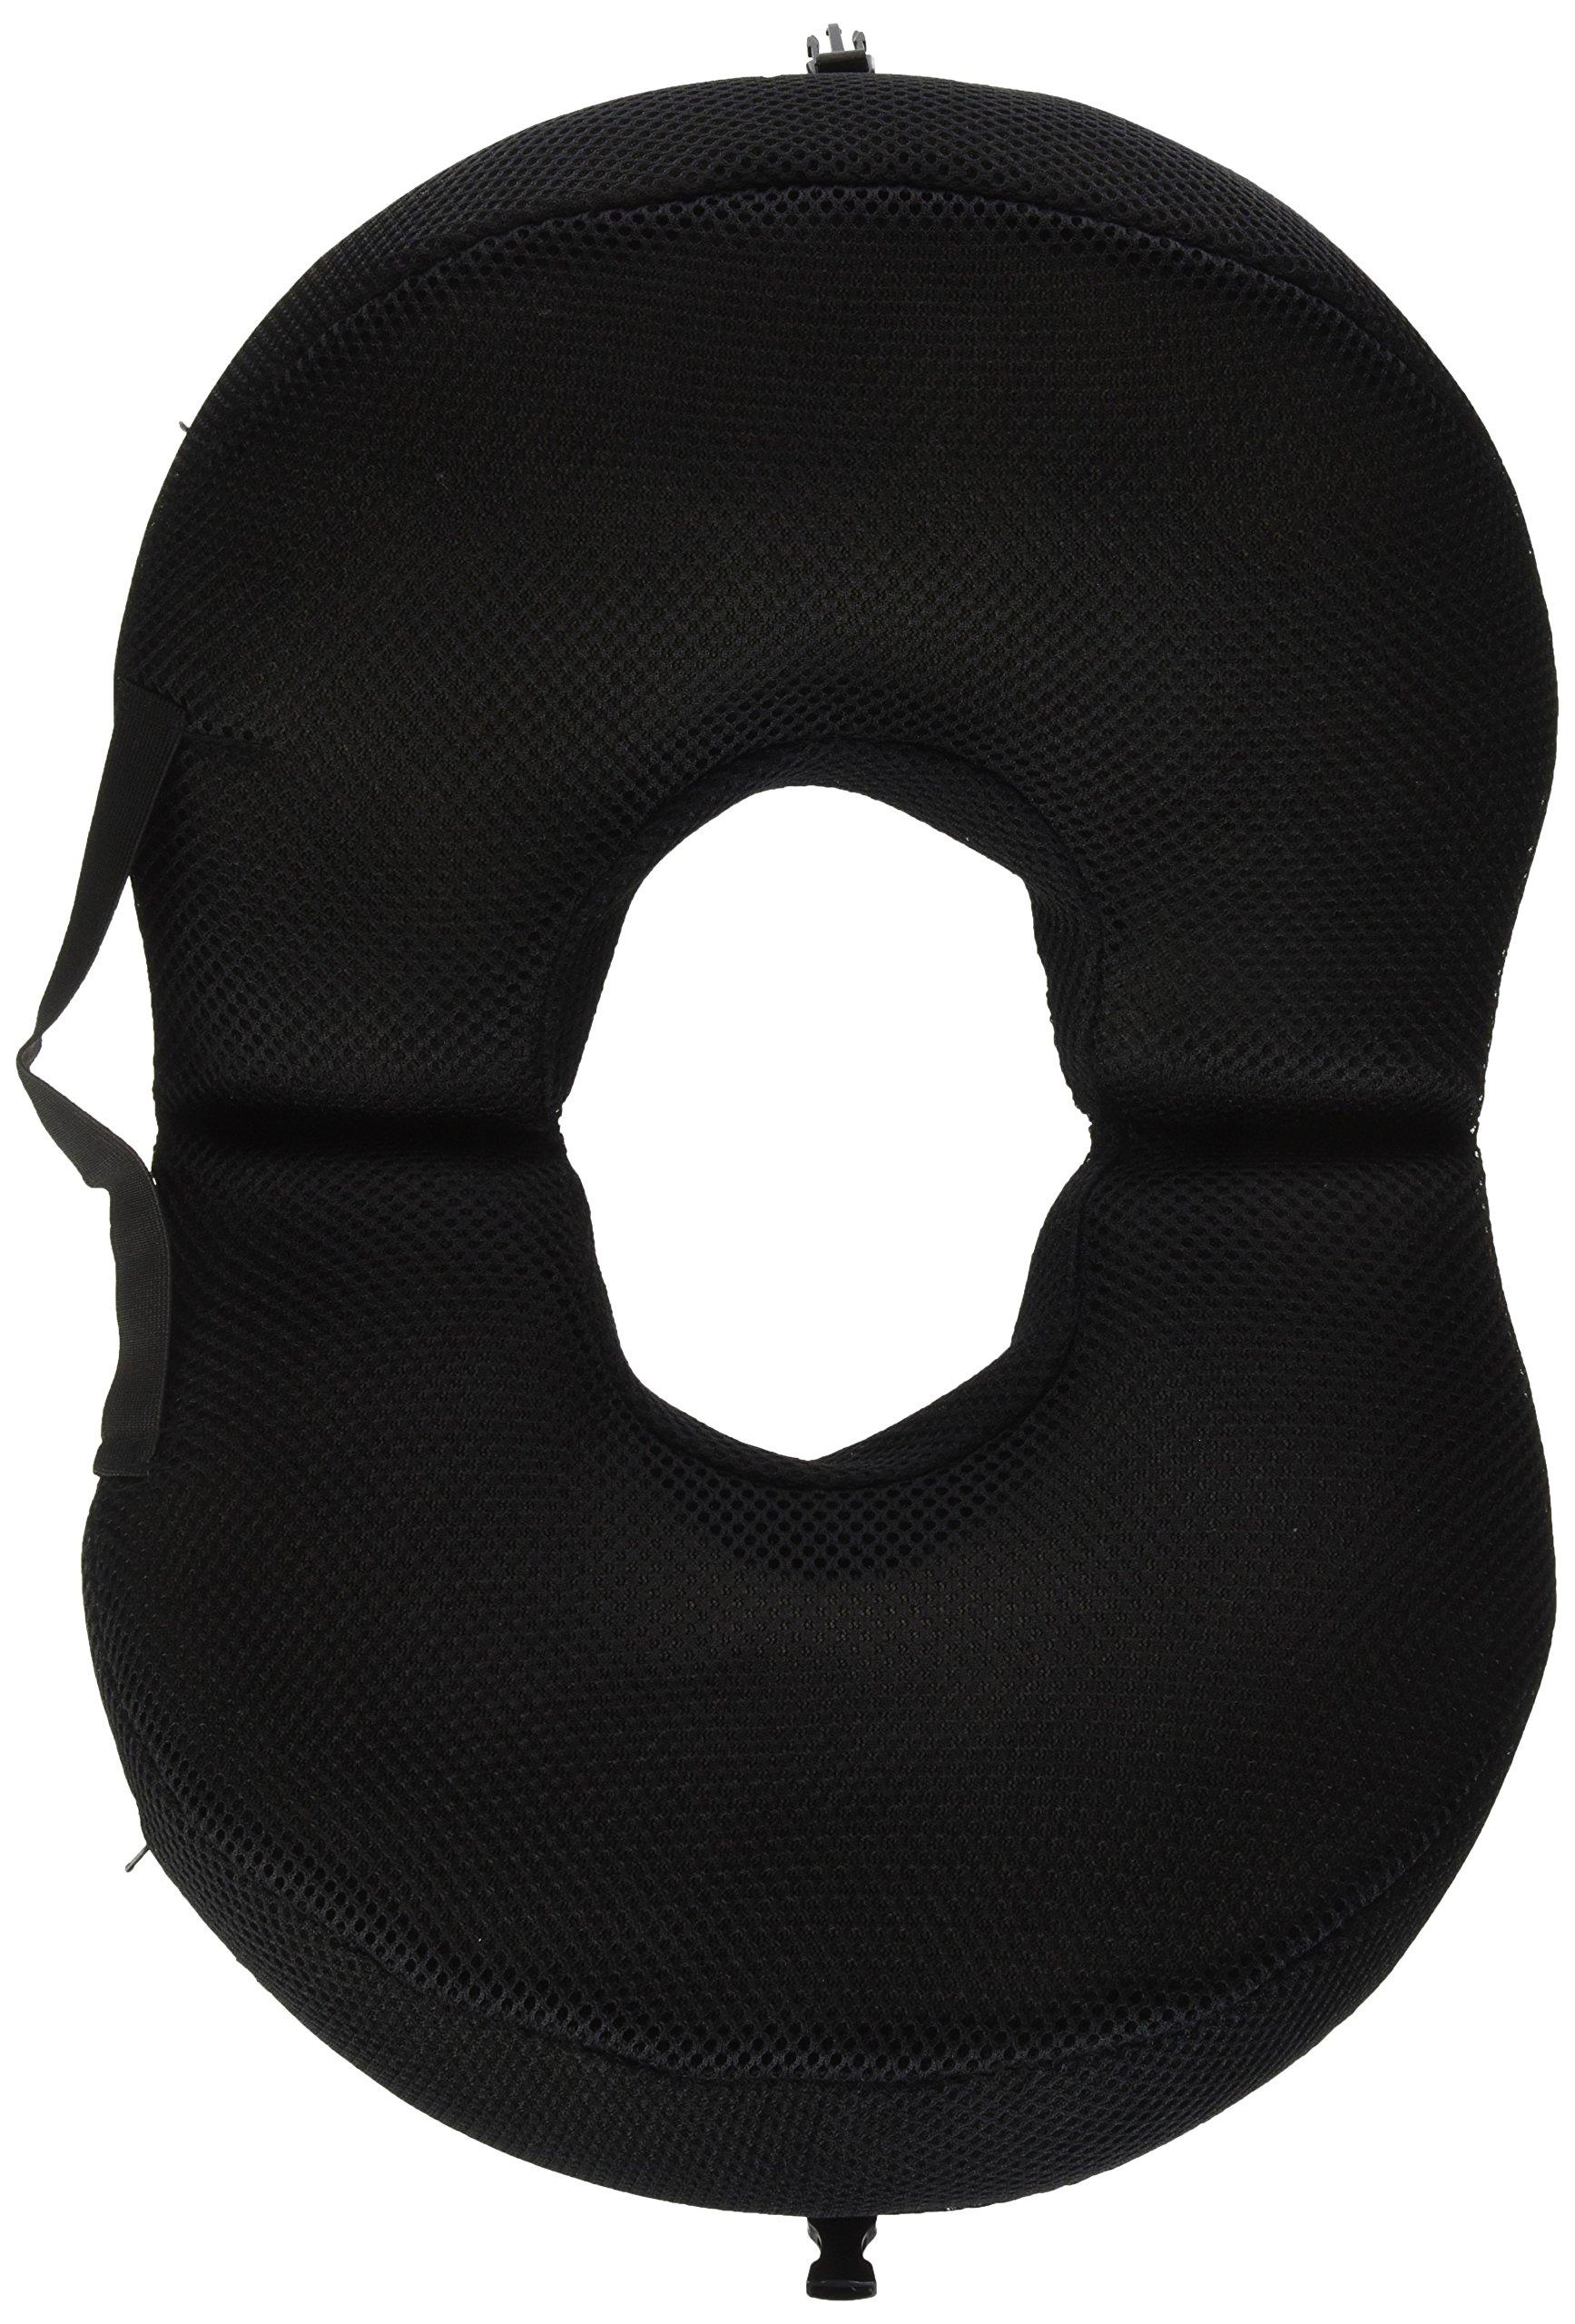 Pcp Foldable Circular Travel Ring Cushion, Black